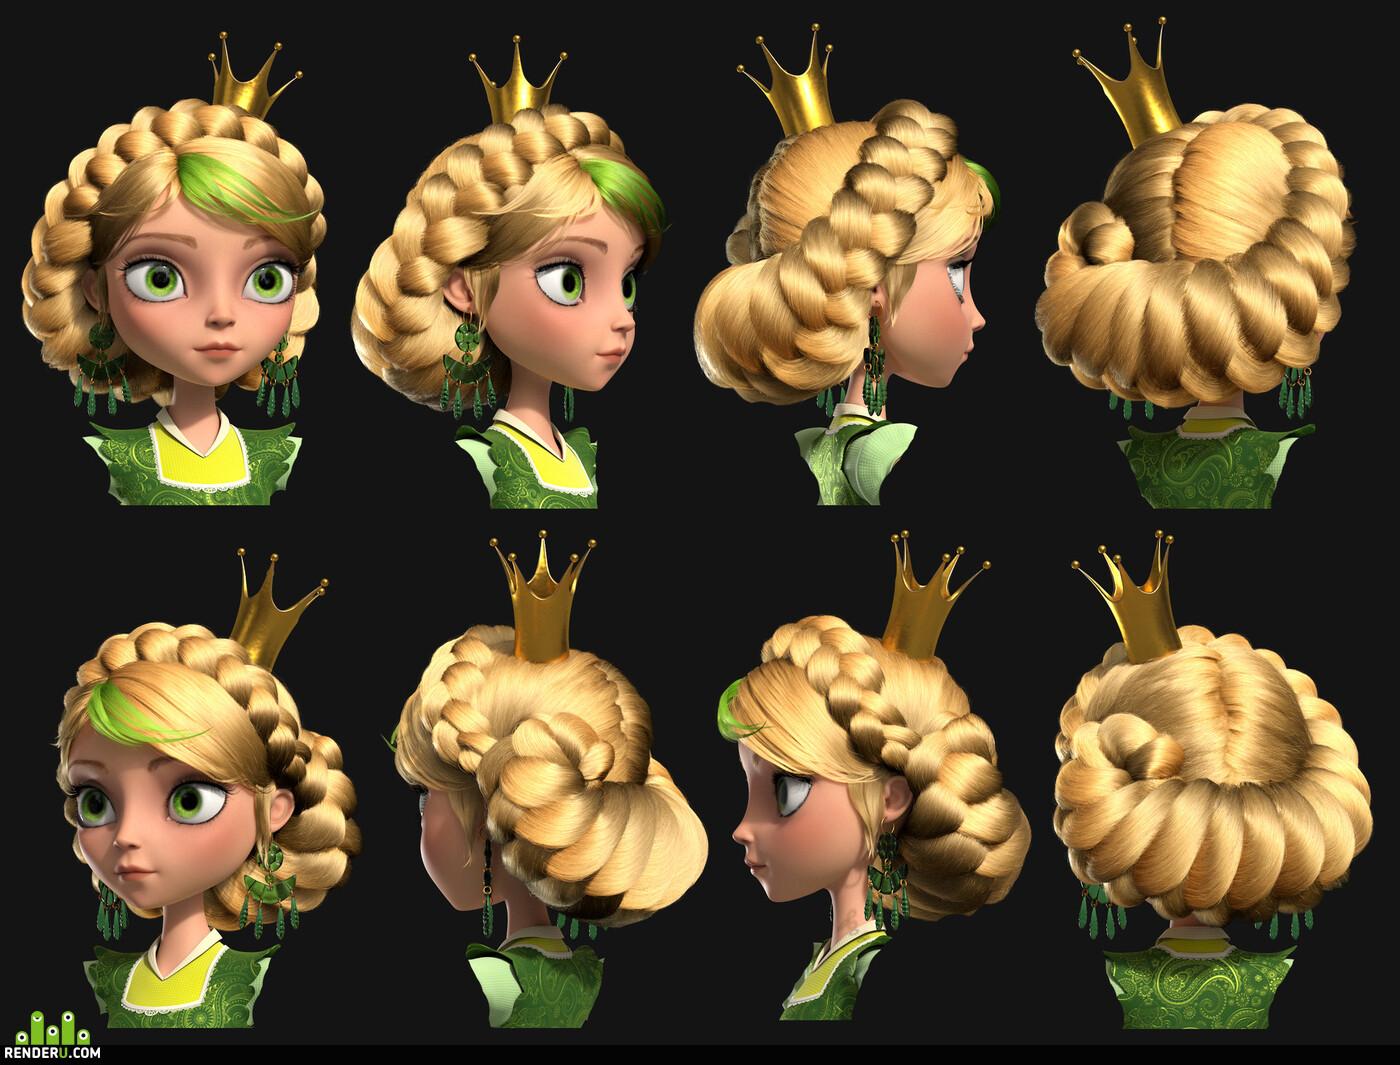 3ds max, cartoon character, characterart, characterdesign, female character, Maya